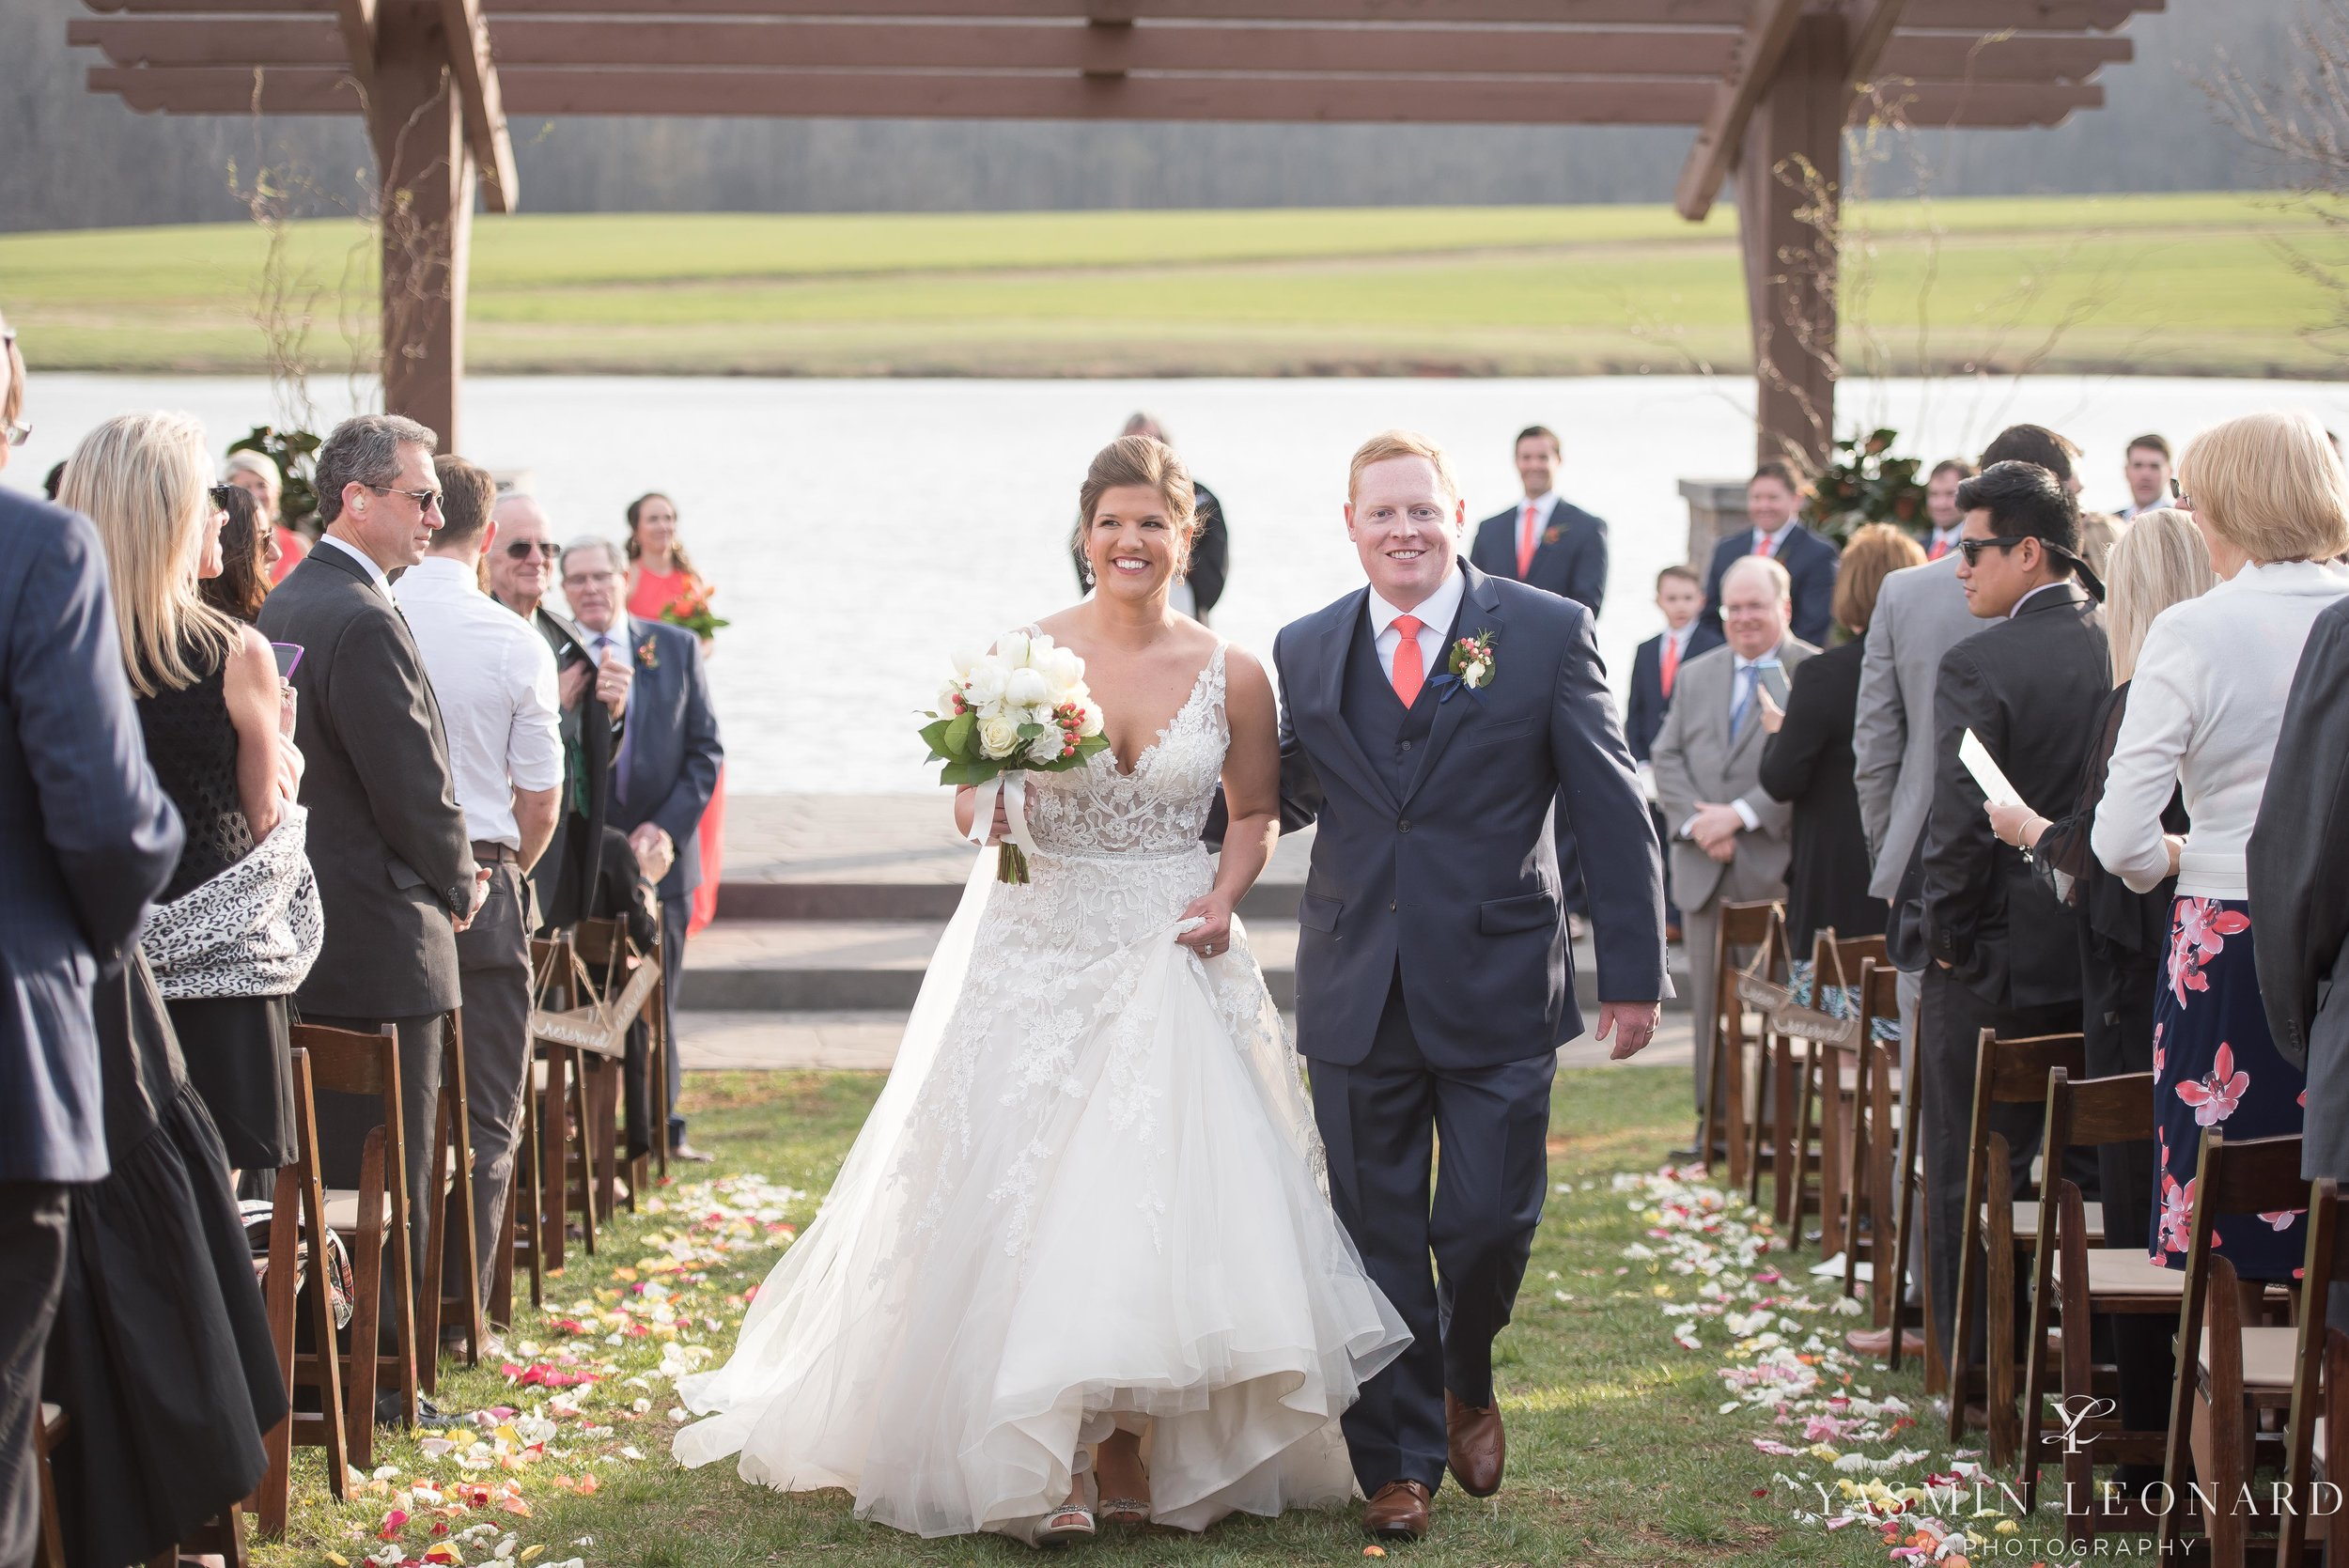 Adaumont Farm - Adaumont Farm Weddings - Trinity Weddings - NC Weddings - Yasmin Leonard Photography-38.jpg